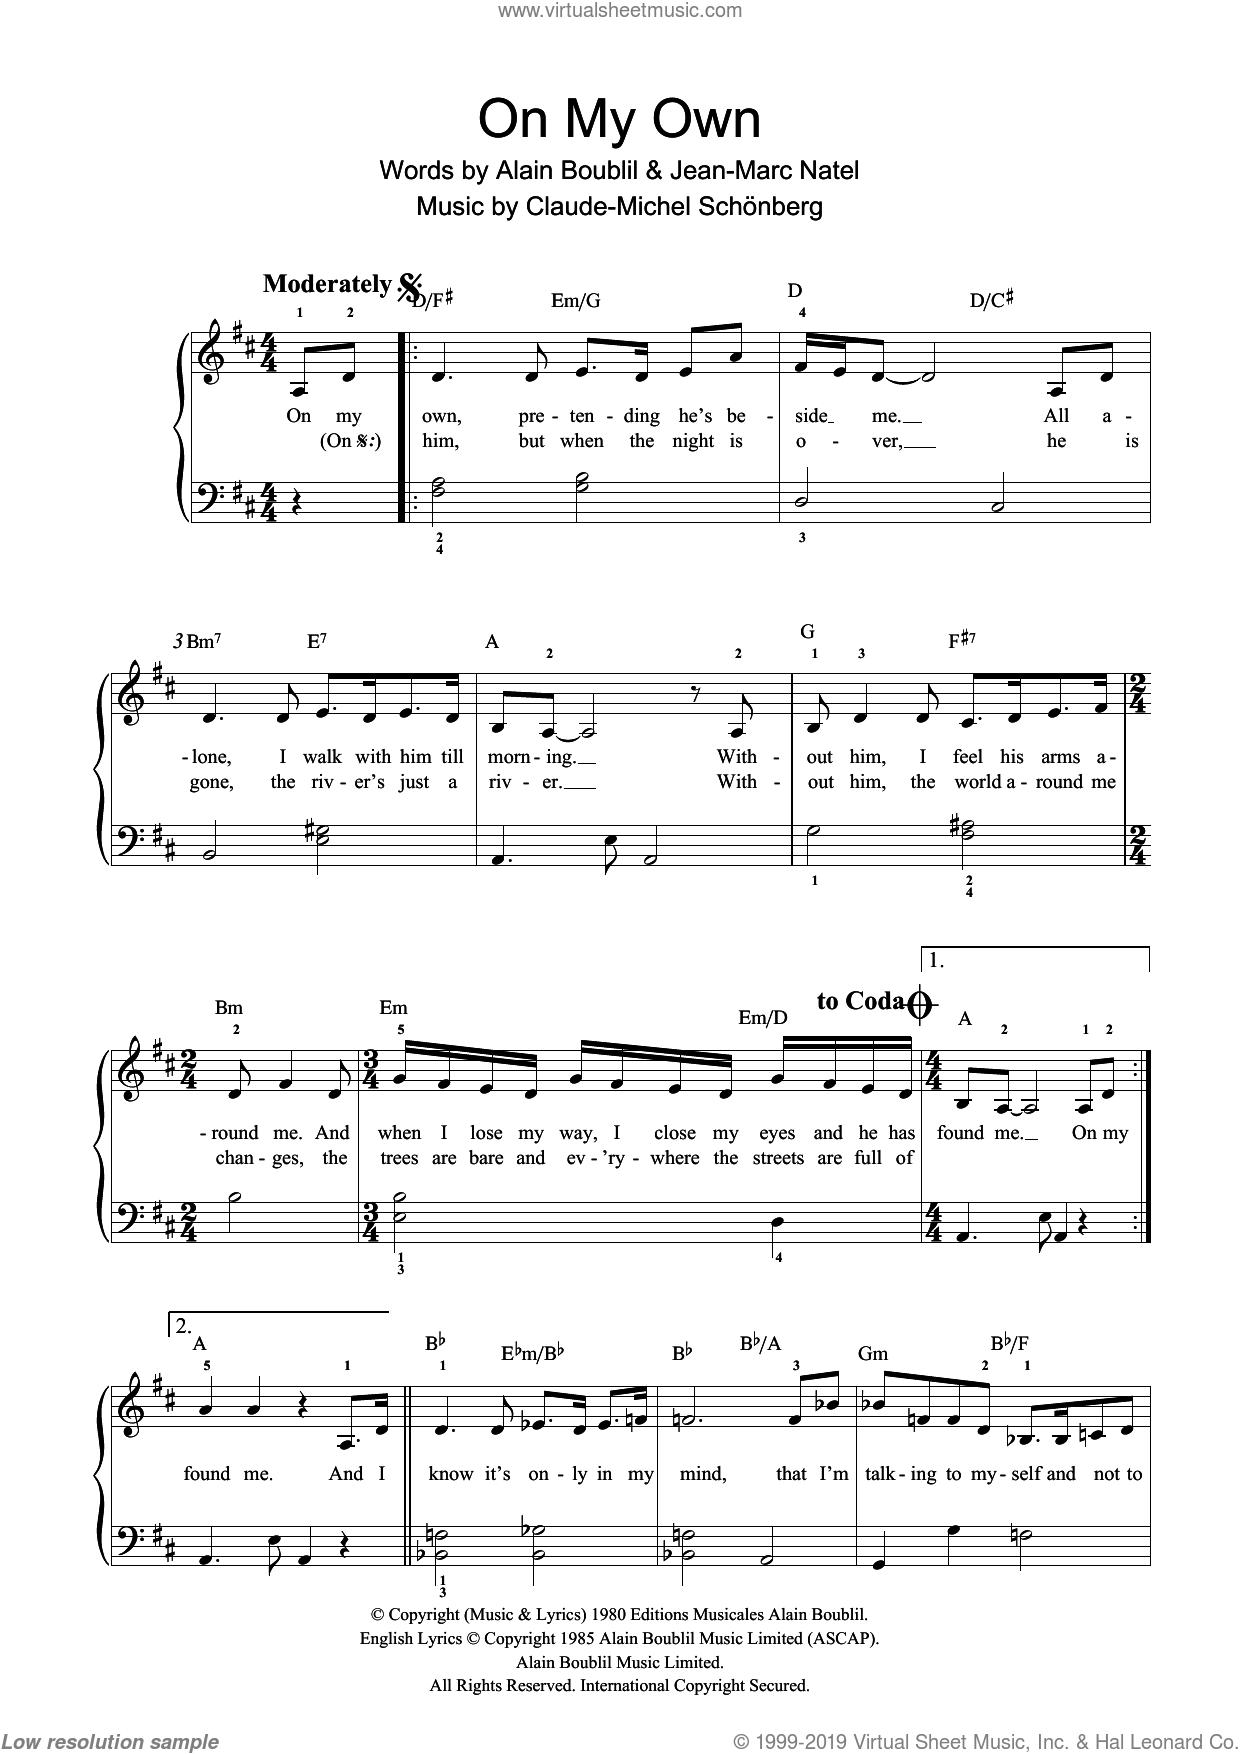 On My Own (from Les Miserables) sheet music for piano solo (beginners) by Alain Boublil, Claude-Michel Schonberg, Herbert Kretzmer, Jean-Marc Natel, John Caird and Trevor Nunn, beginner piano (beginners)